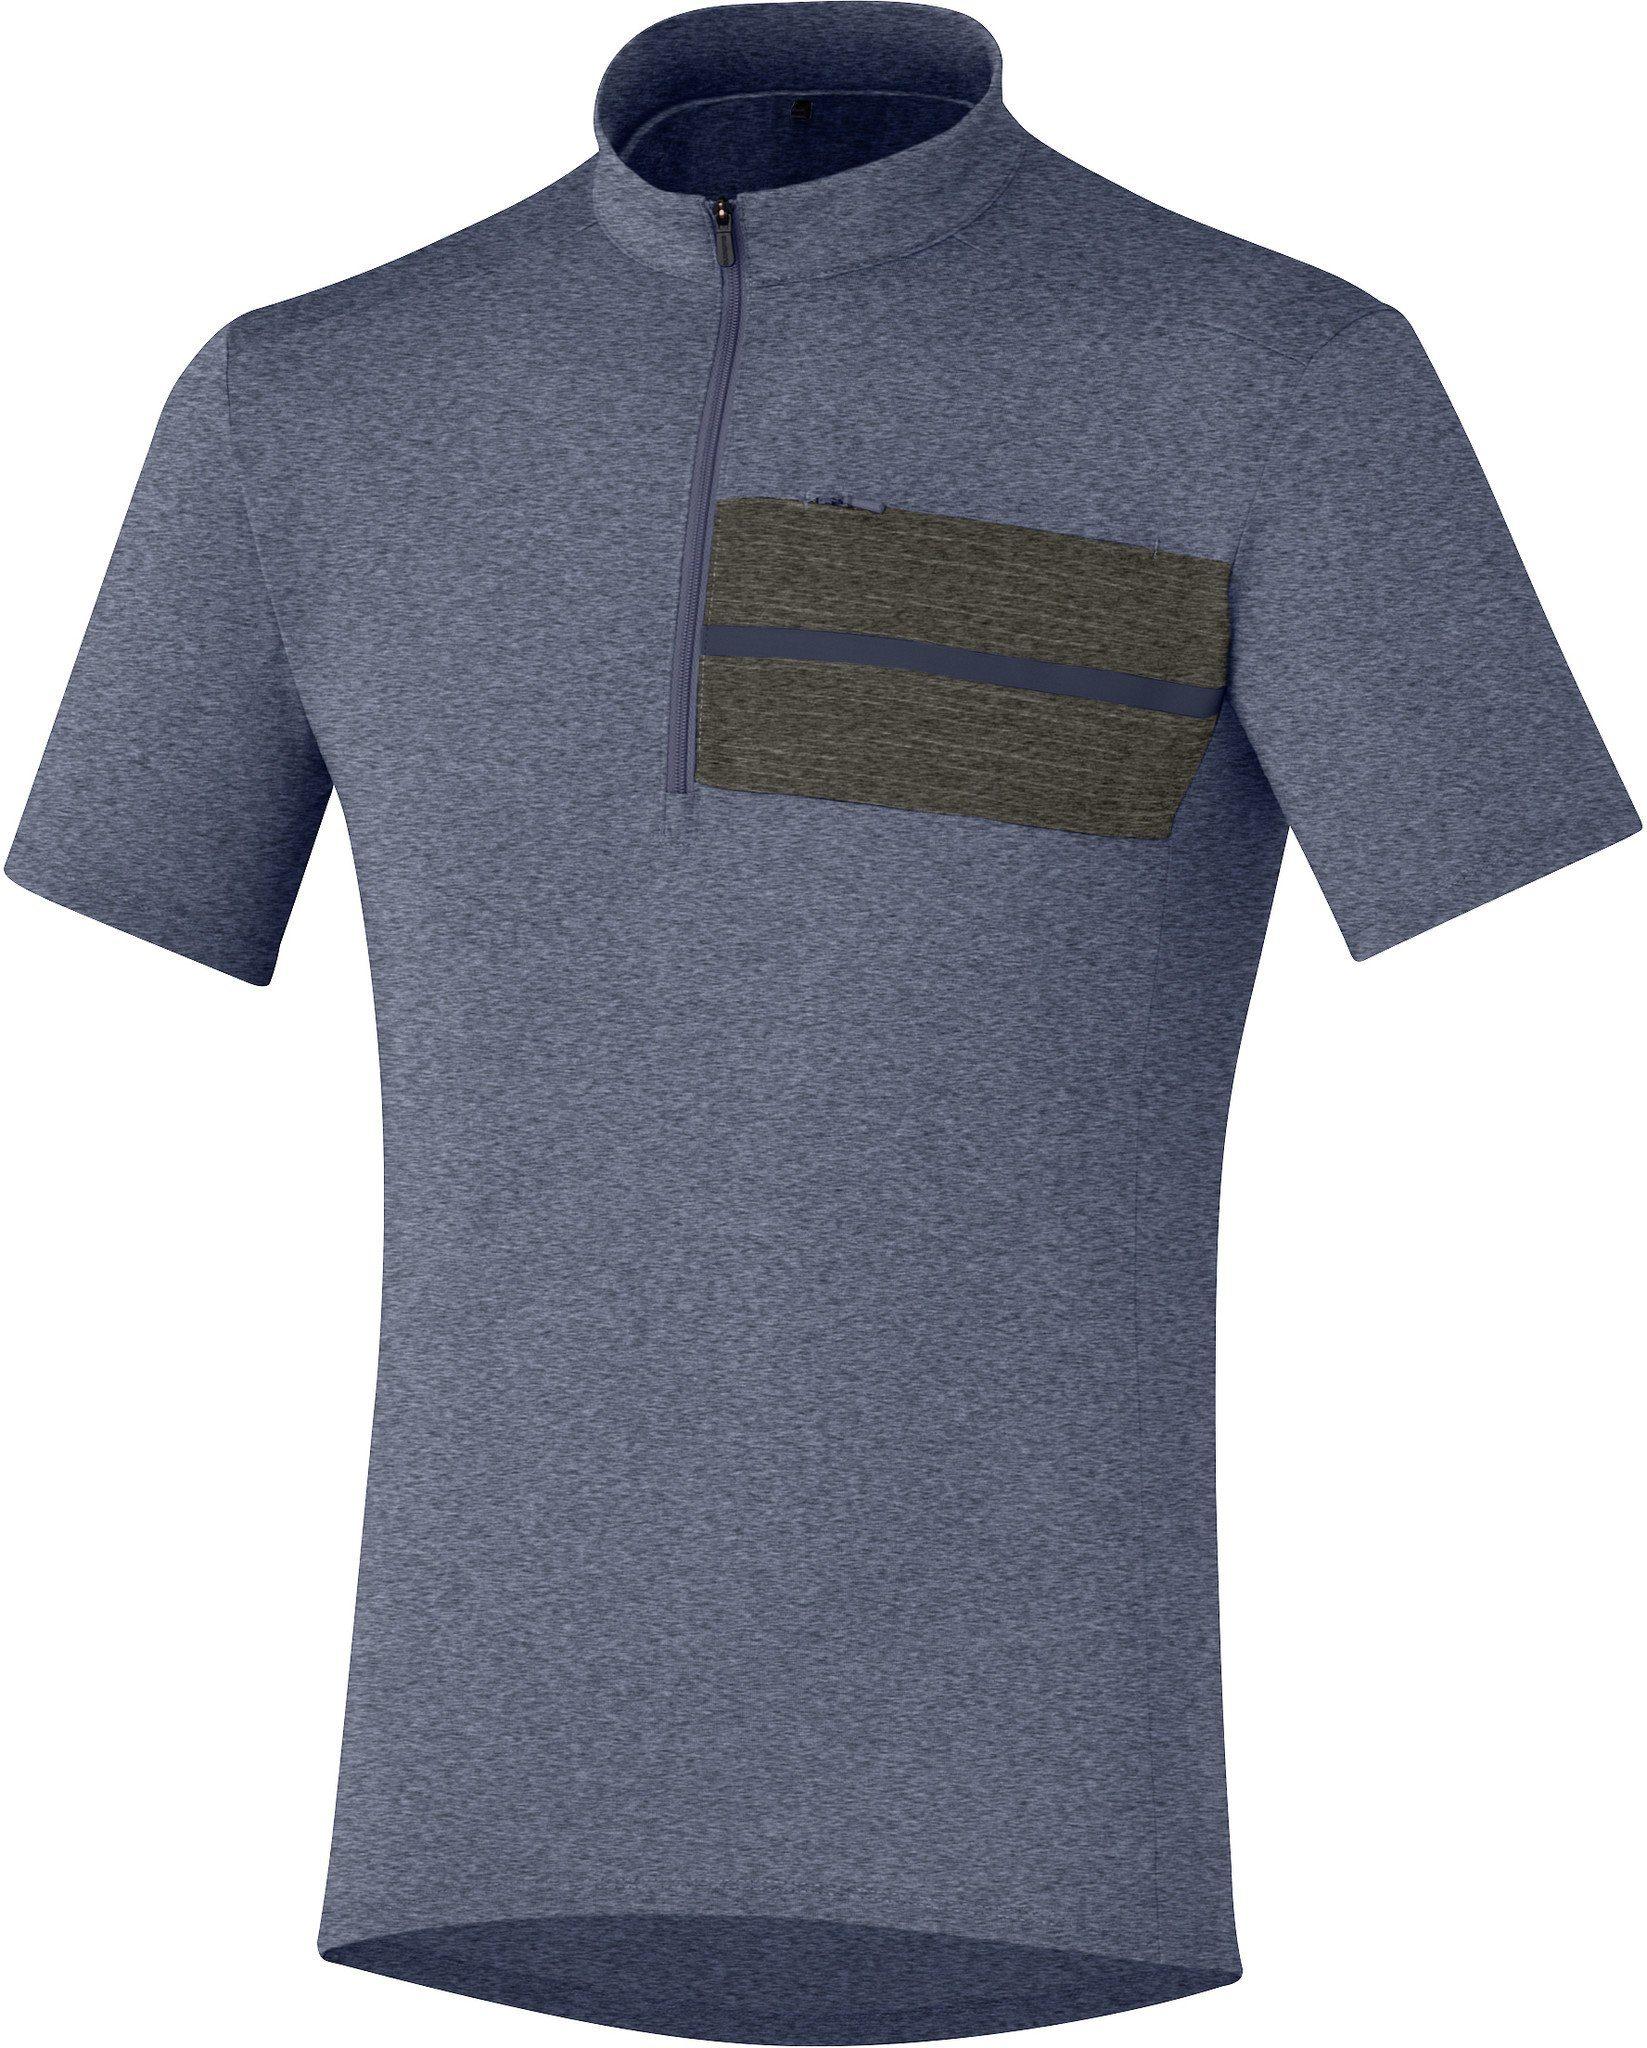 Shimano T-Shirt »Transit Pavement Stripe Jersey Men«